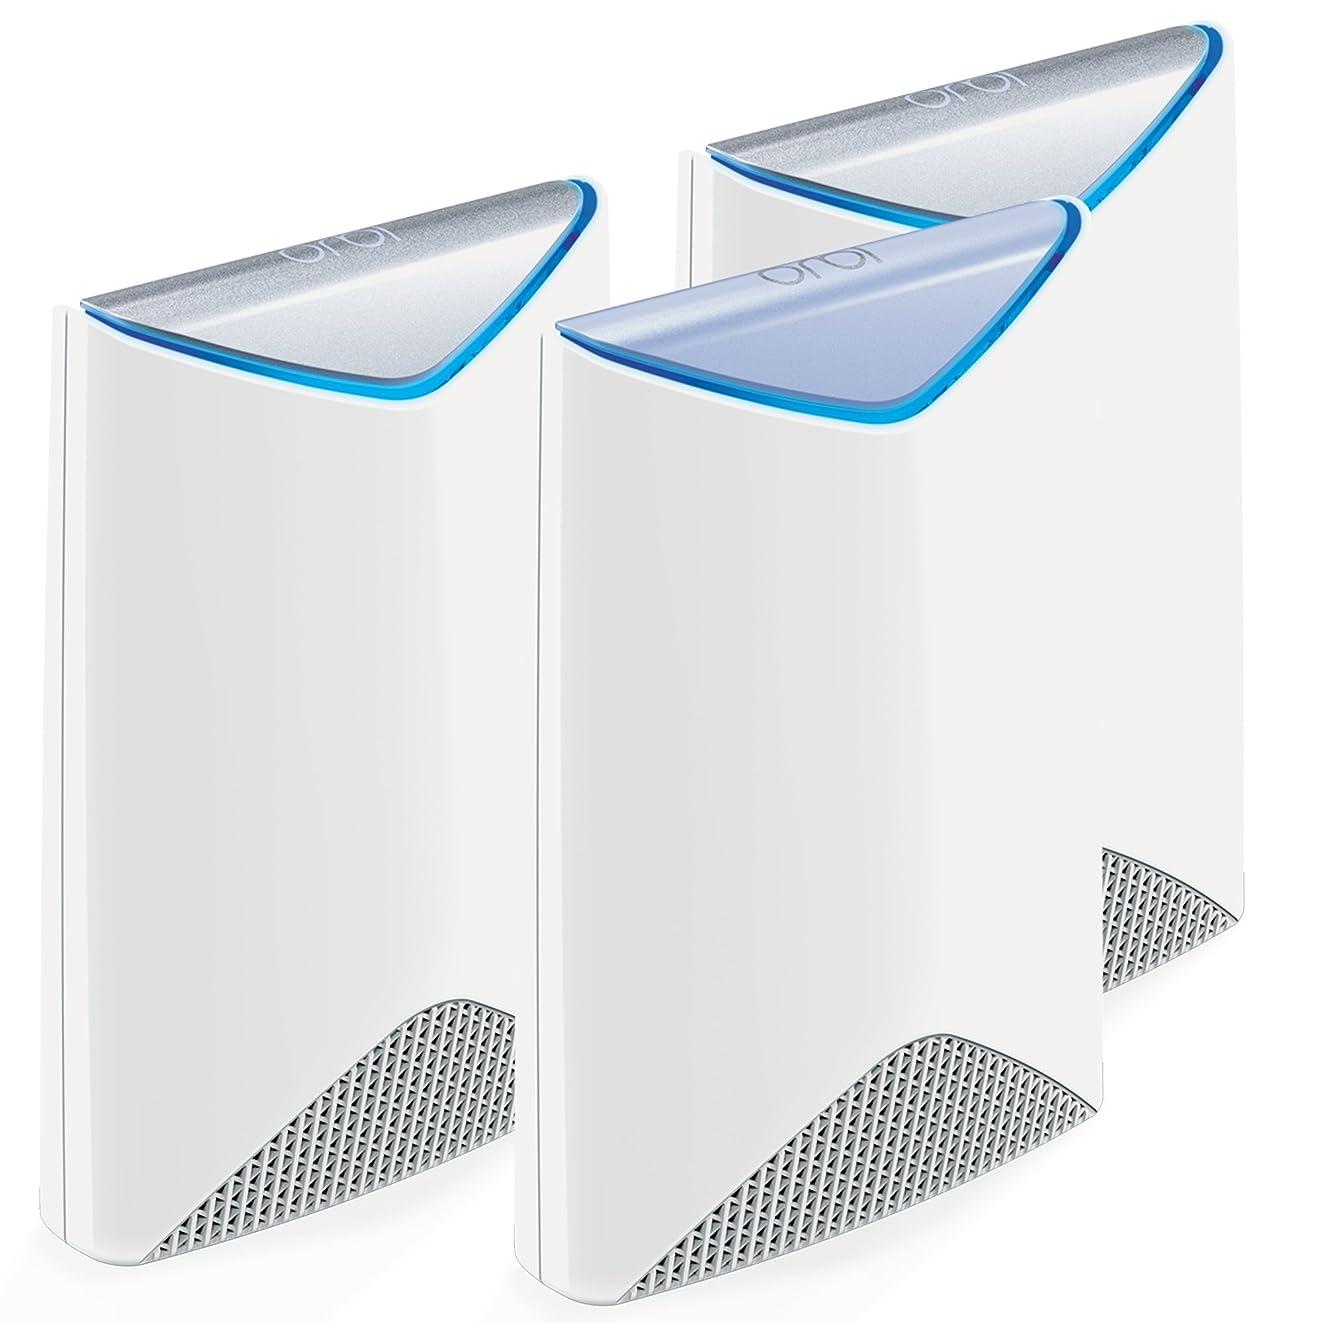 NETGEAR Orbi Pro AC3000 Business Mesh WiFi System, 3-Pack, Wireless Access Point (SRK60B03)